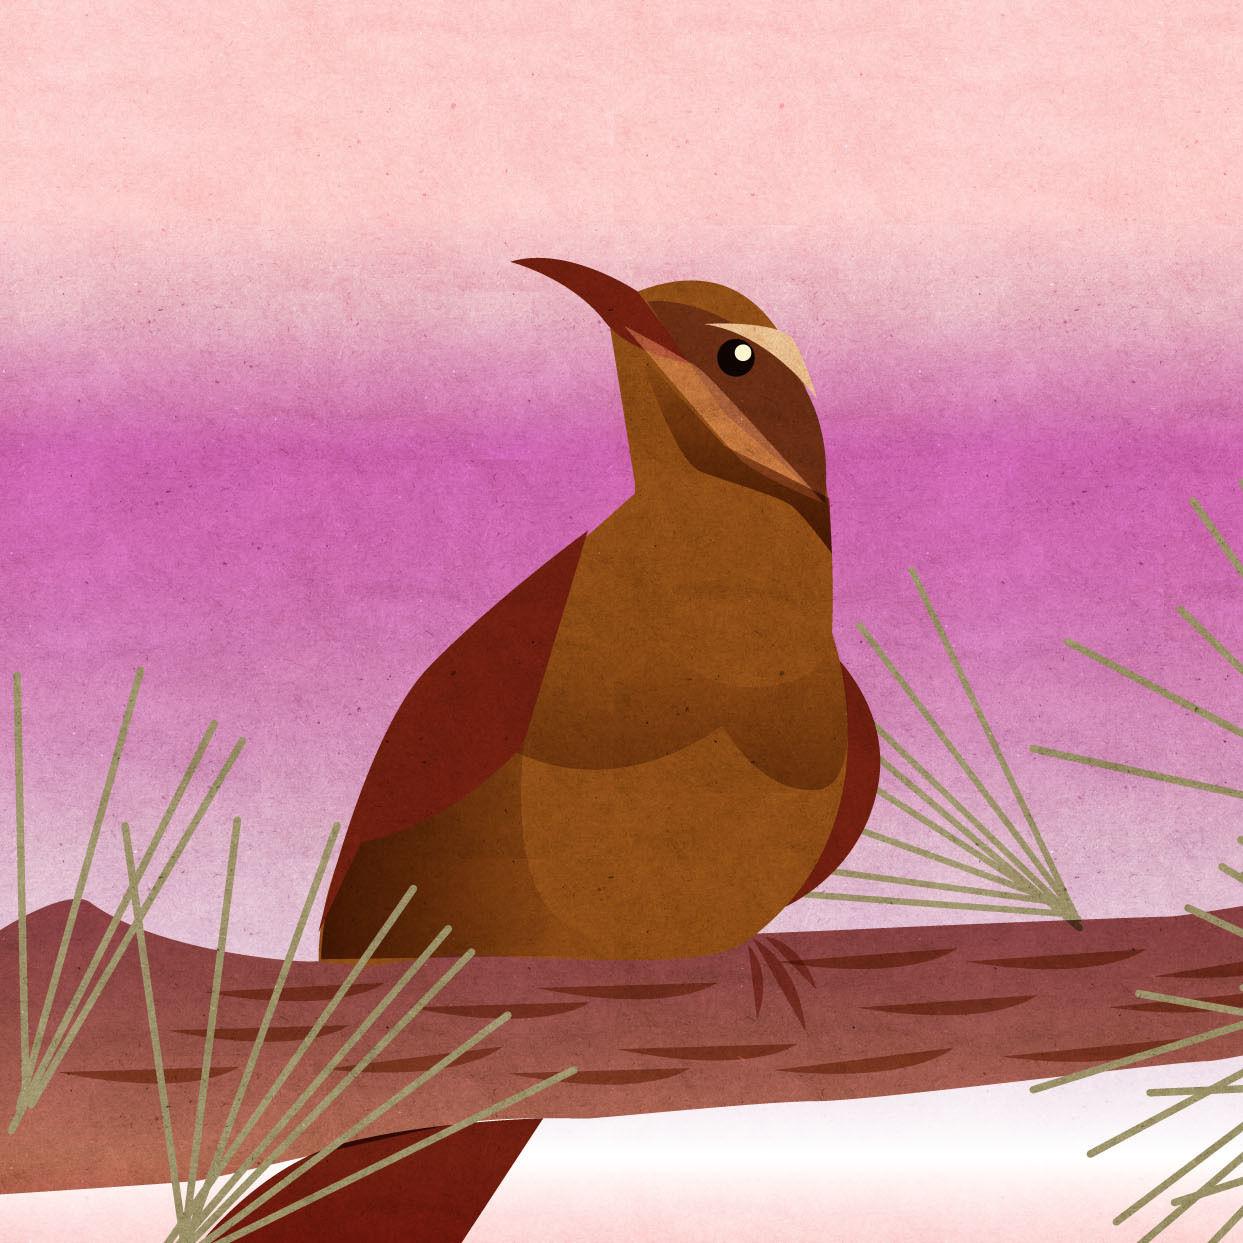 Pomo 1016 editors note bird illustration ovfnma